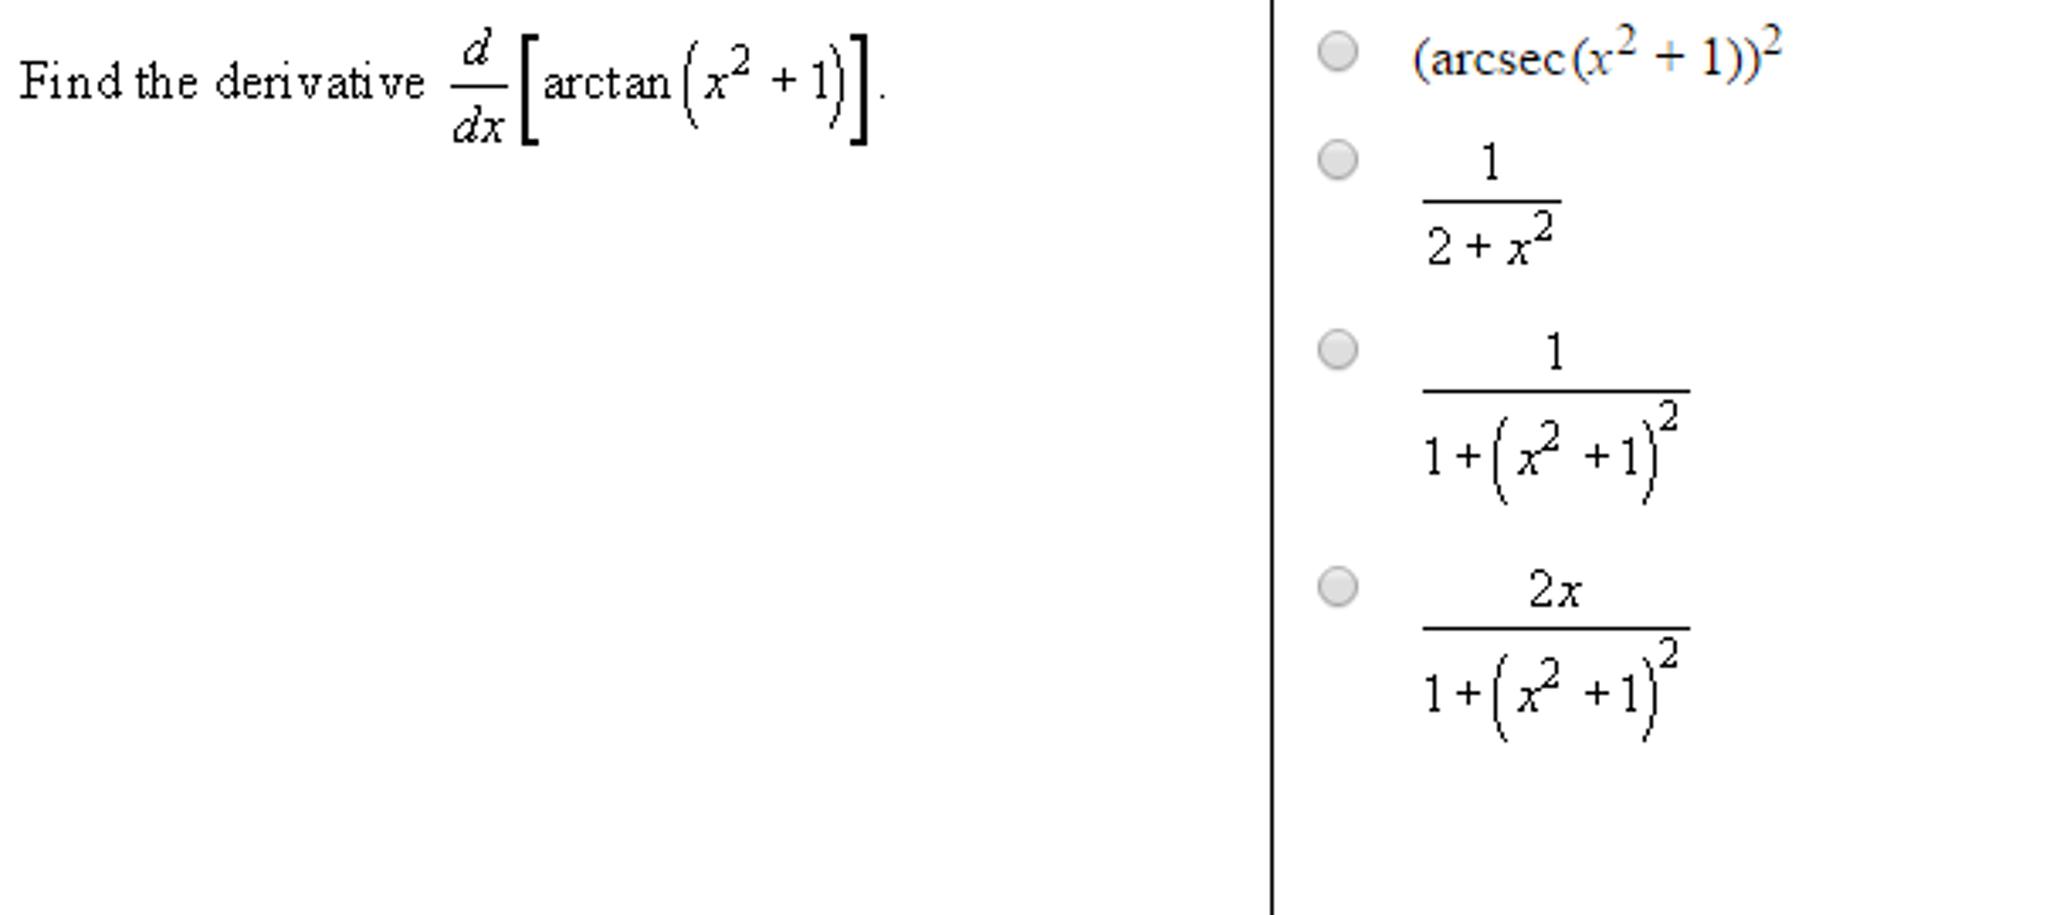 Find the derivative d/dx[arctan(x^2 + 1)]. (arcse